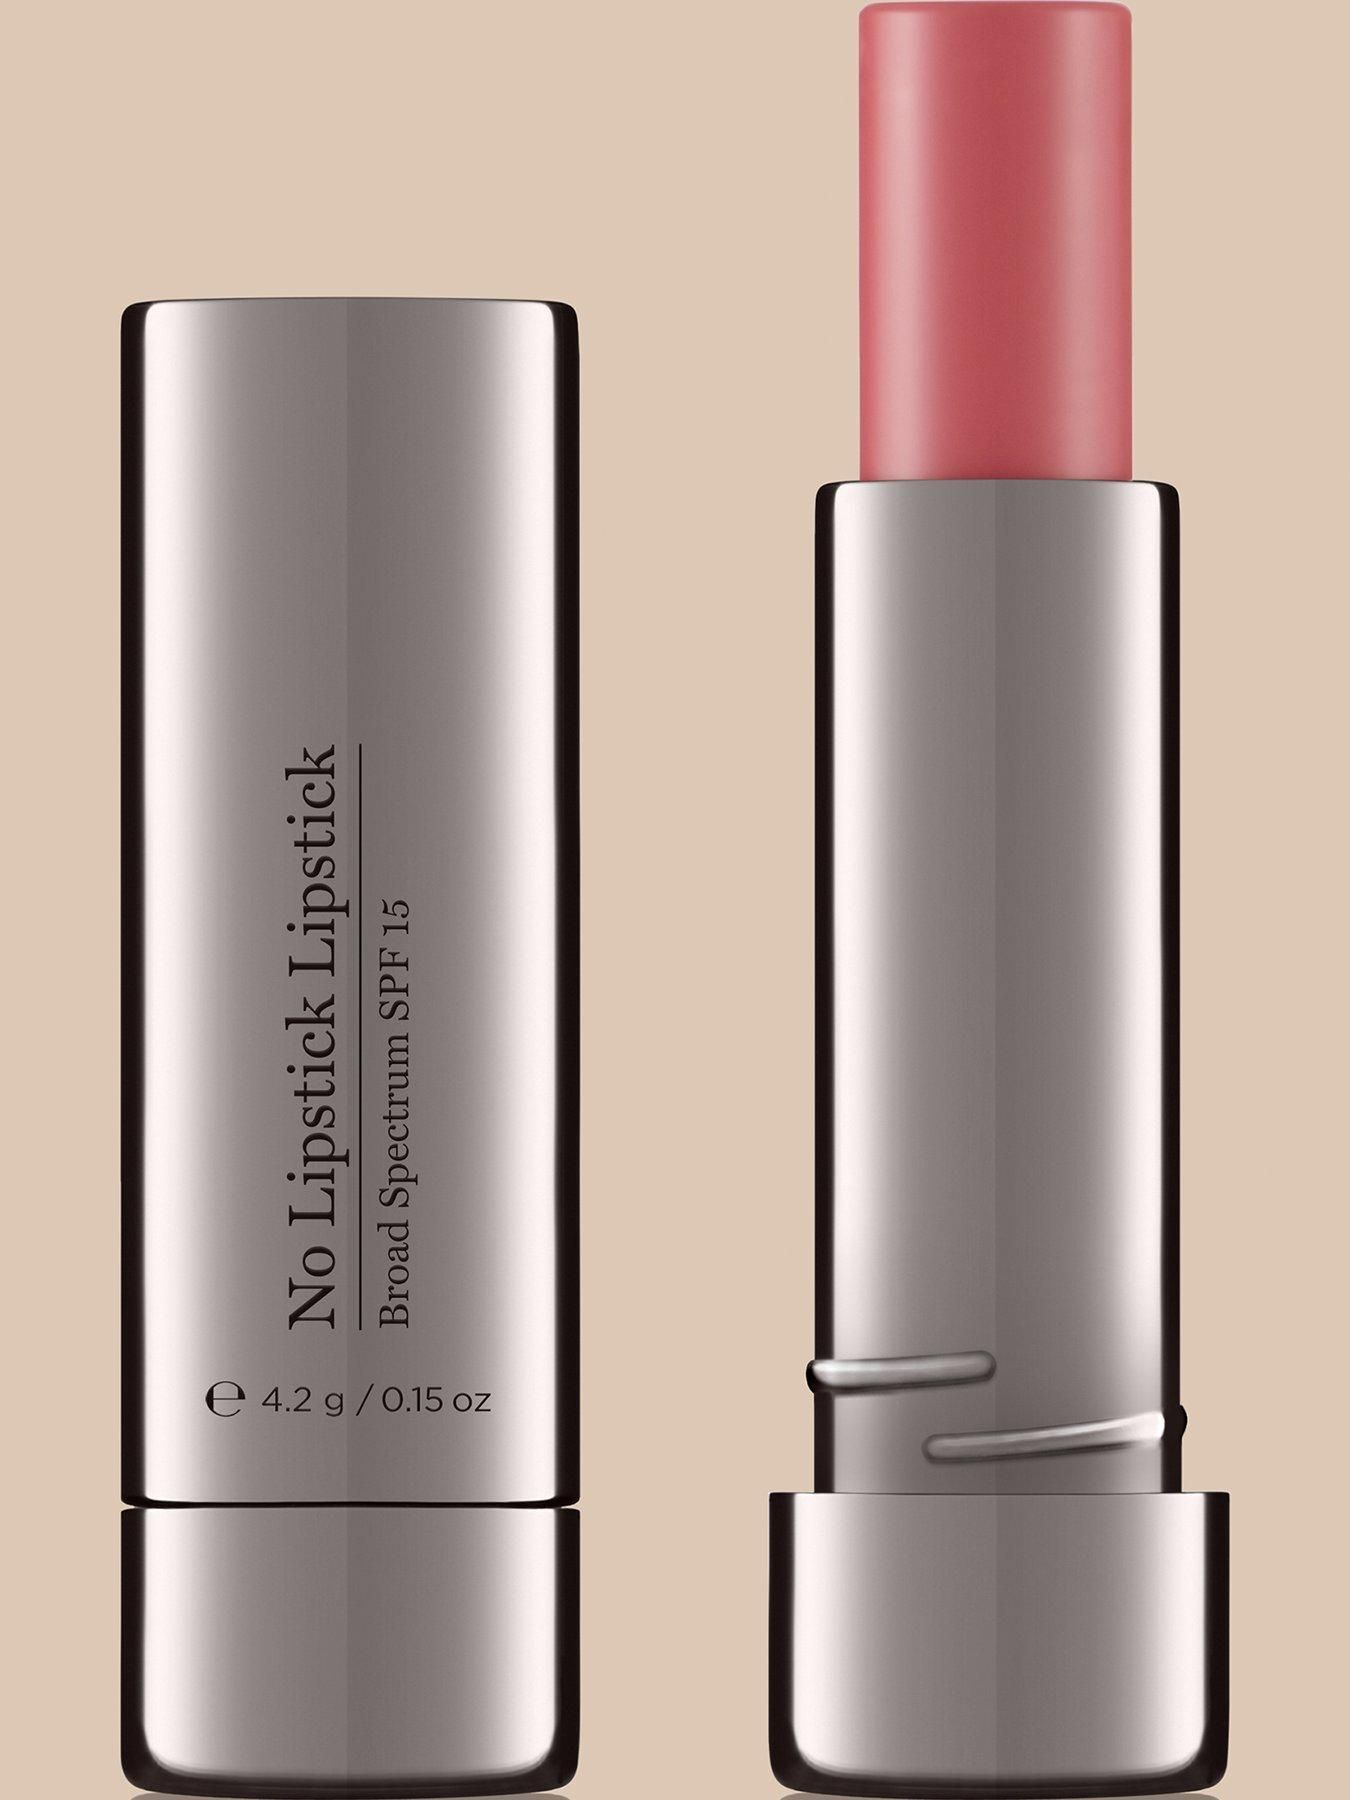 Designer Brands Very.co.uk Perricone, Lipstick, Makeup